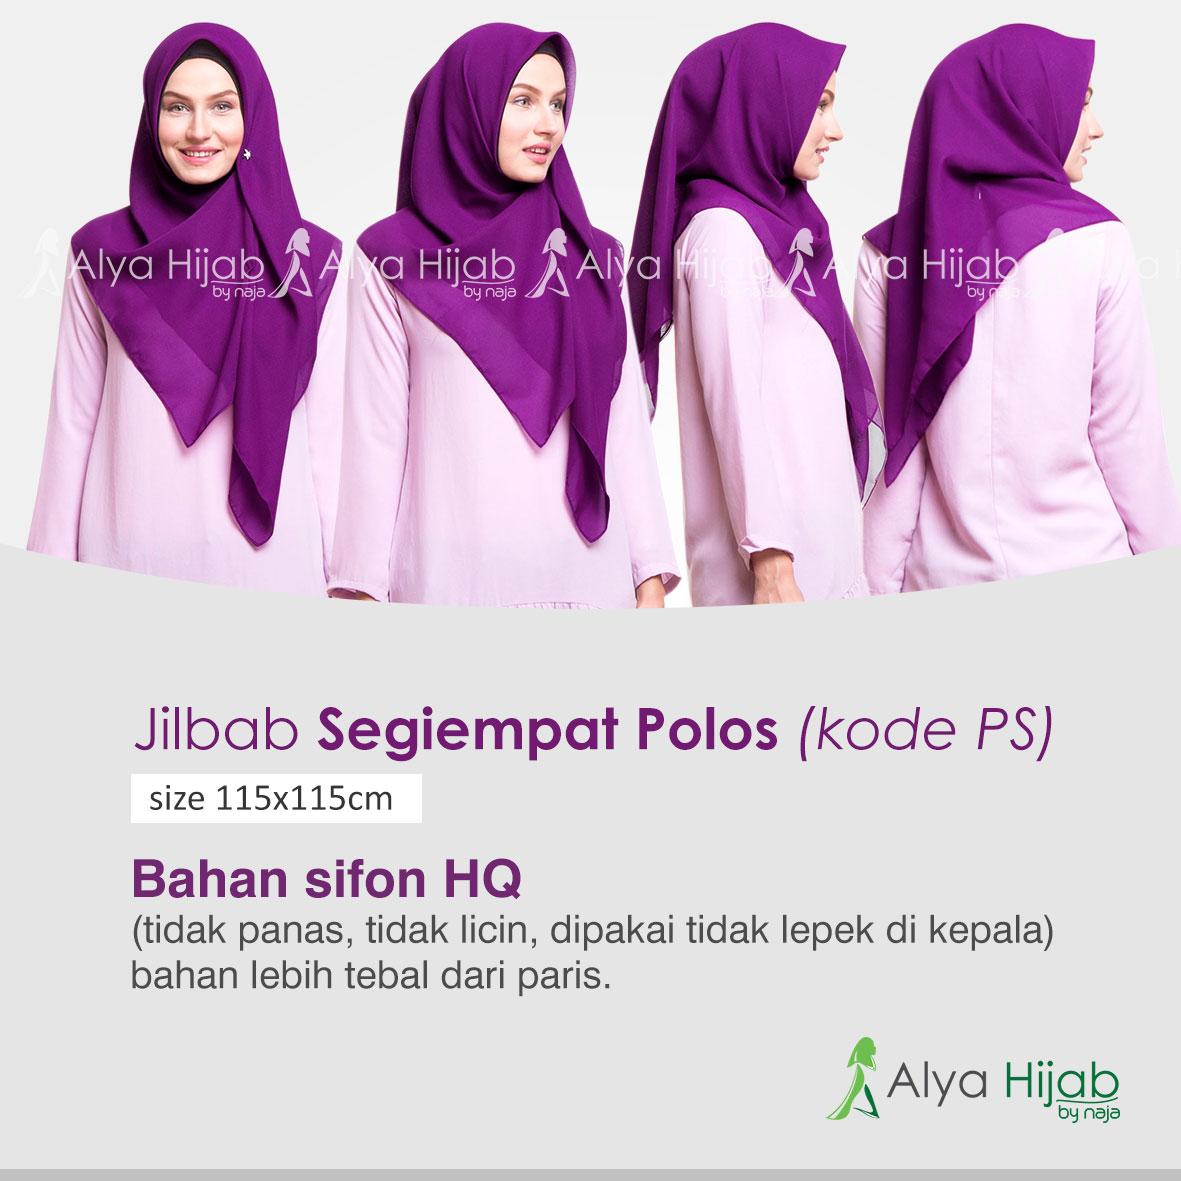 Jilbab Segiempat Polos Alya Hijab By Naja Jual Dan Produsen Segi Empat Paris